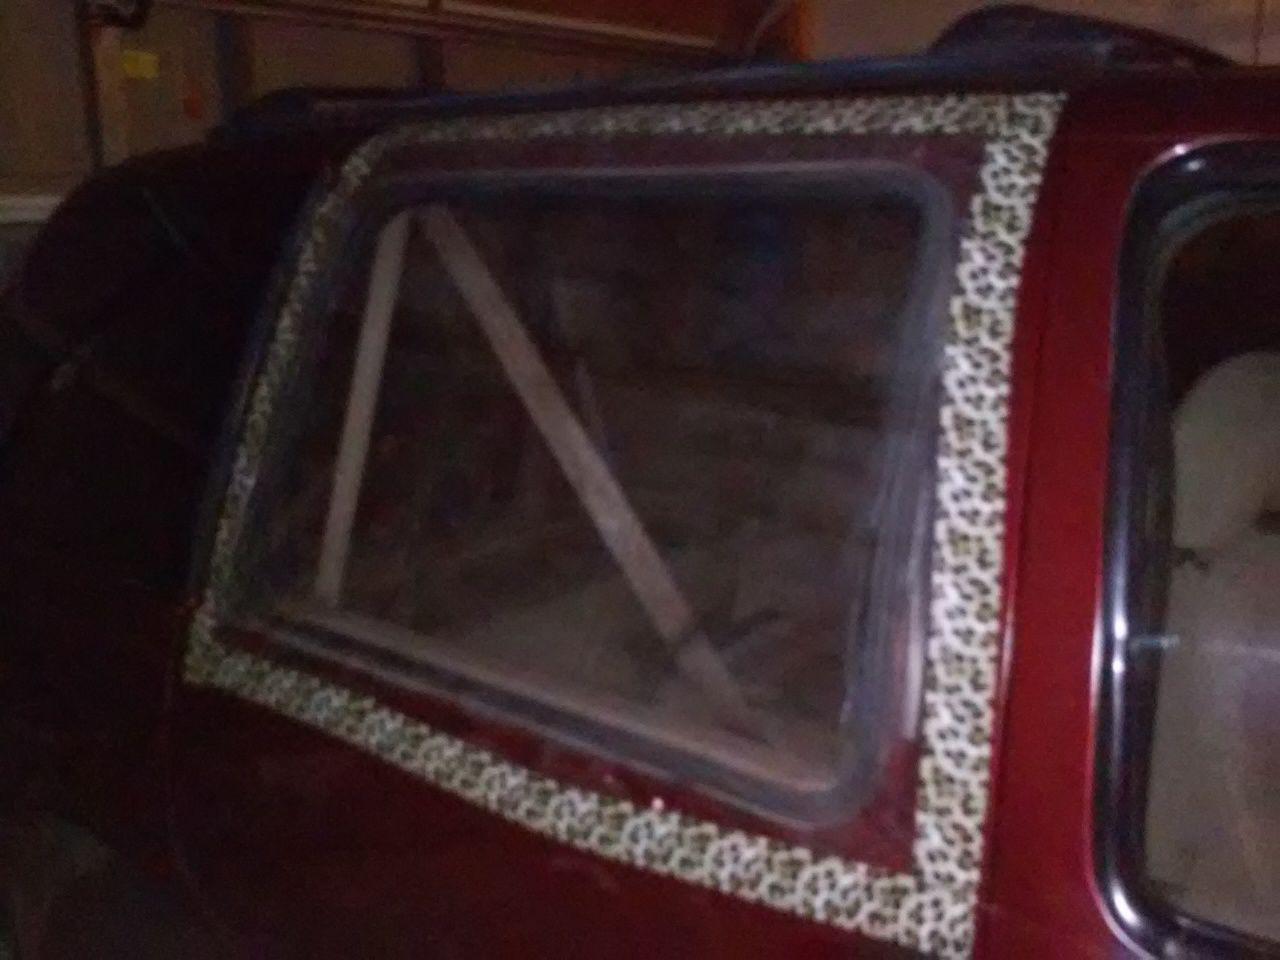 Mercury Villager Mini Van Rear Passenger S Side Door Glass on 1975 Mercury Montego